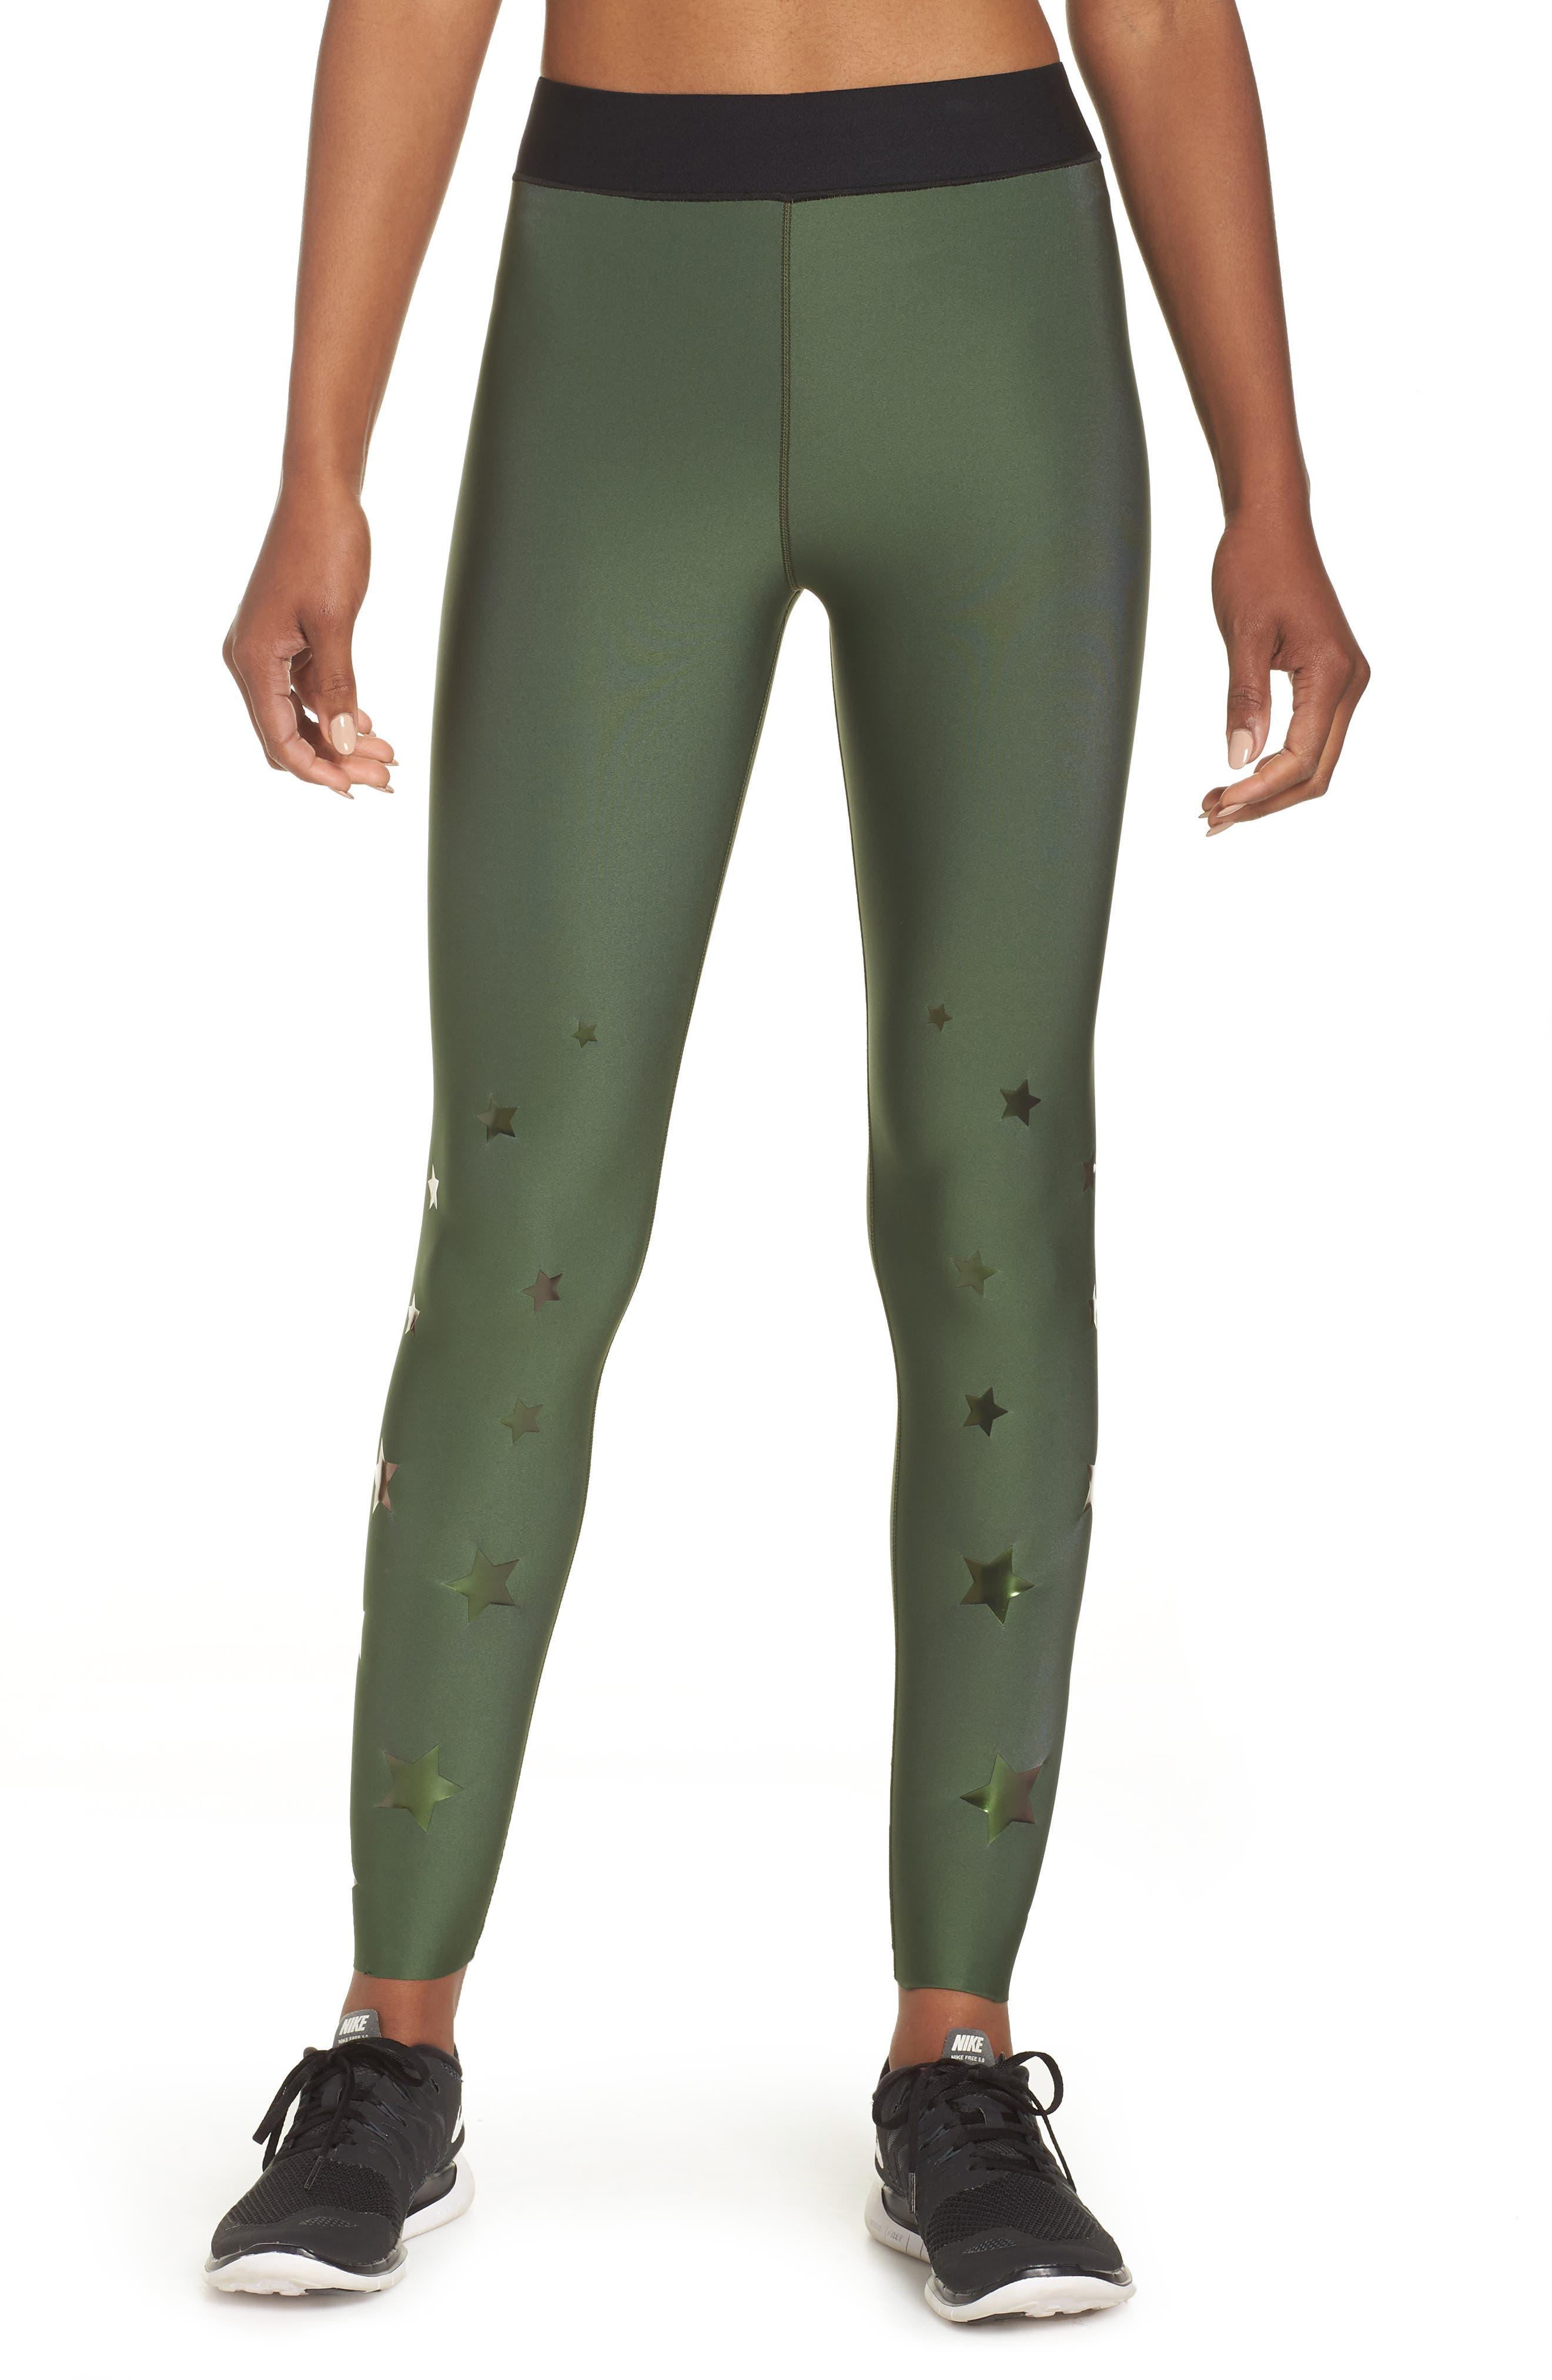 Ultra Luster Leggings,                         Main,                         color, Army Green Beetle